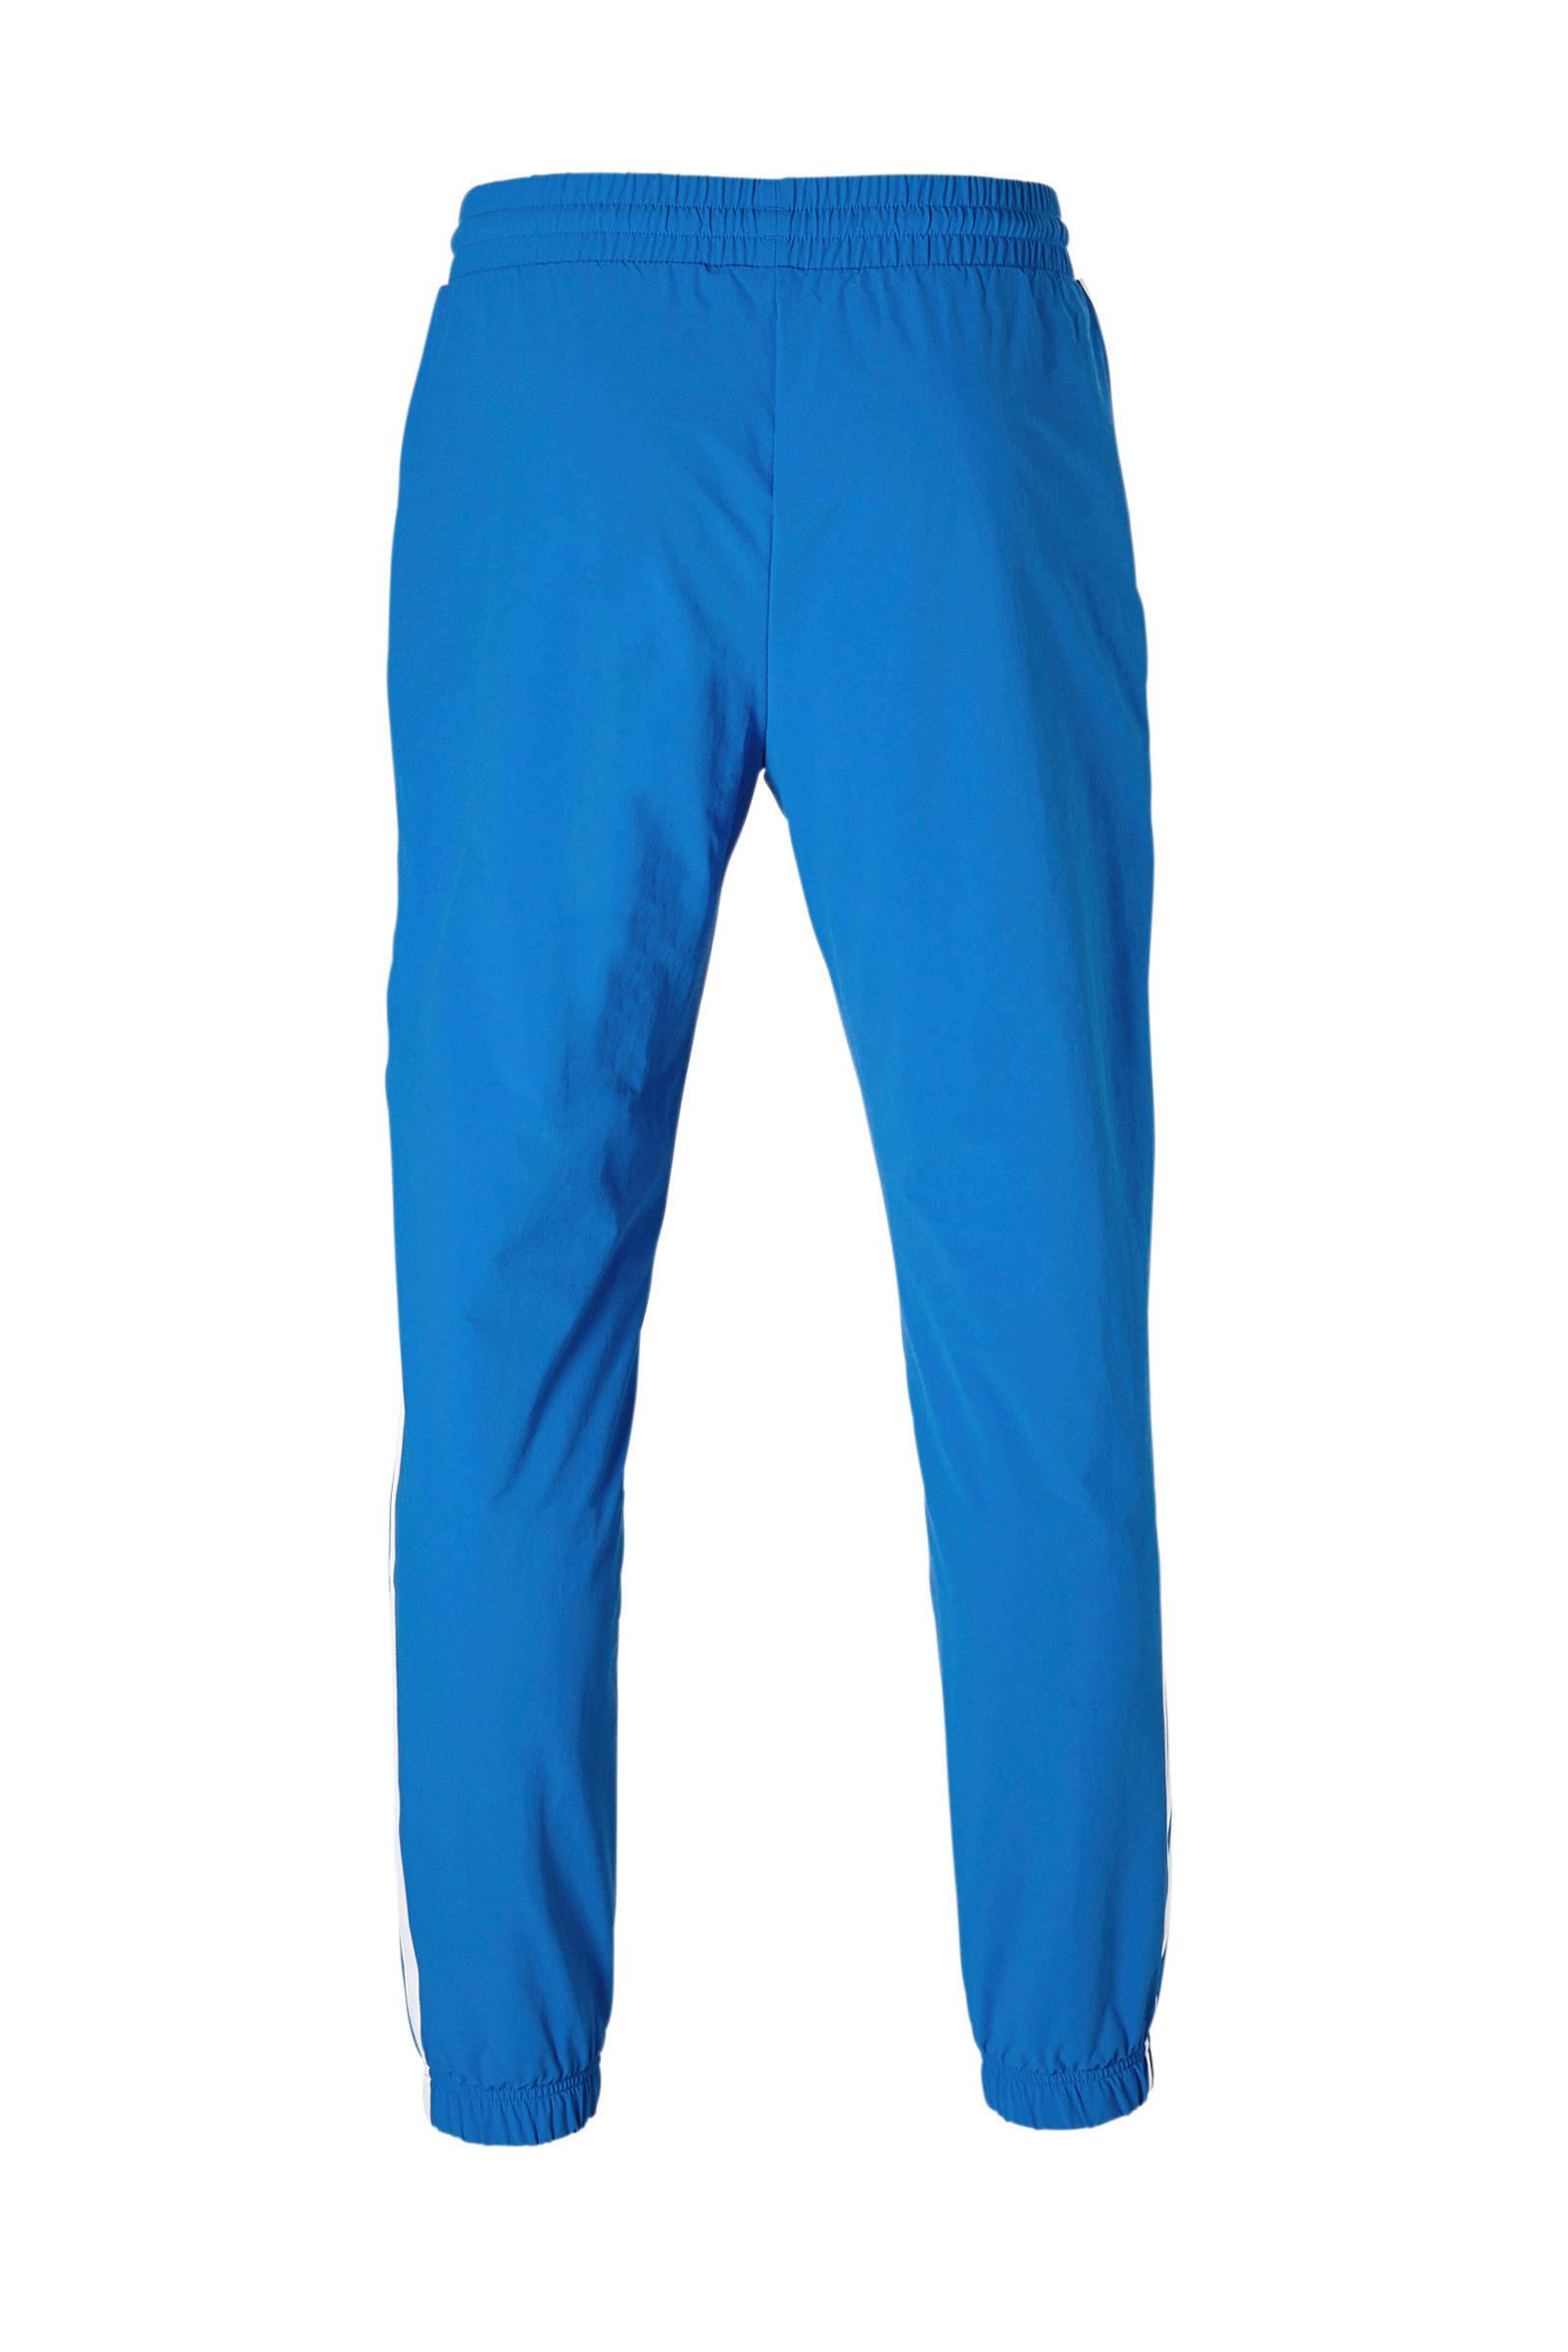 adidas Originals trainingsbroek blauw | wehkamp